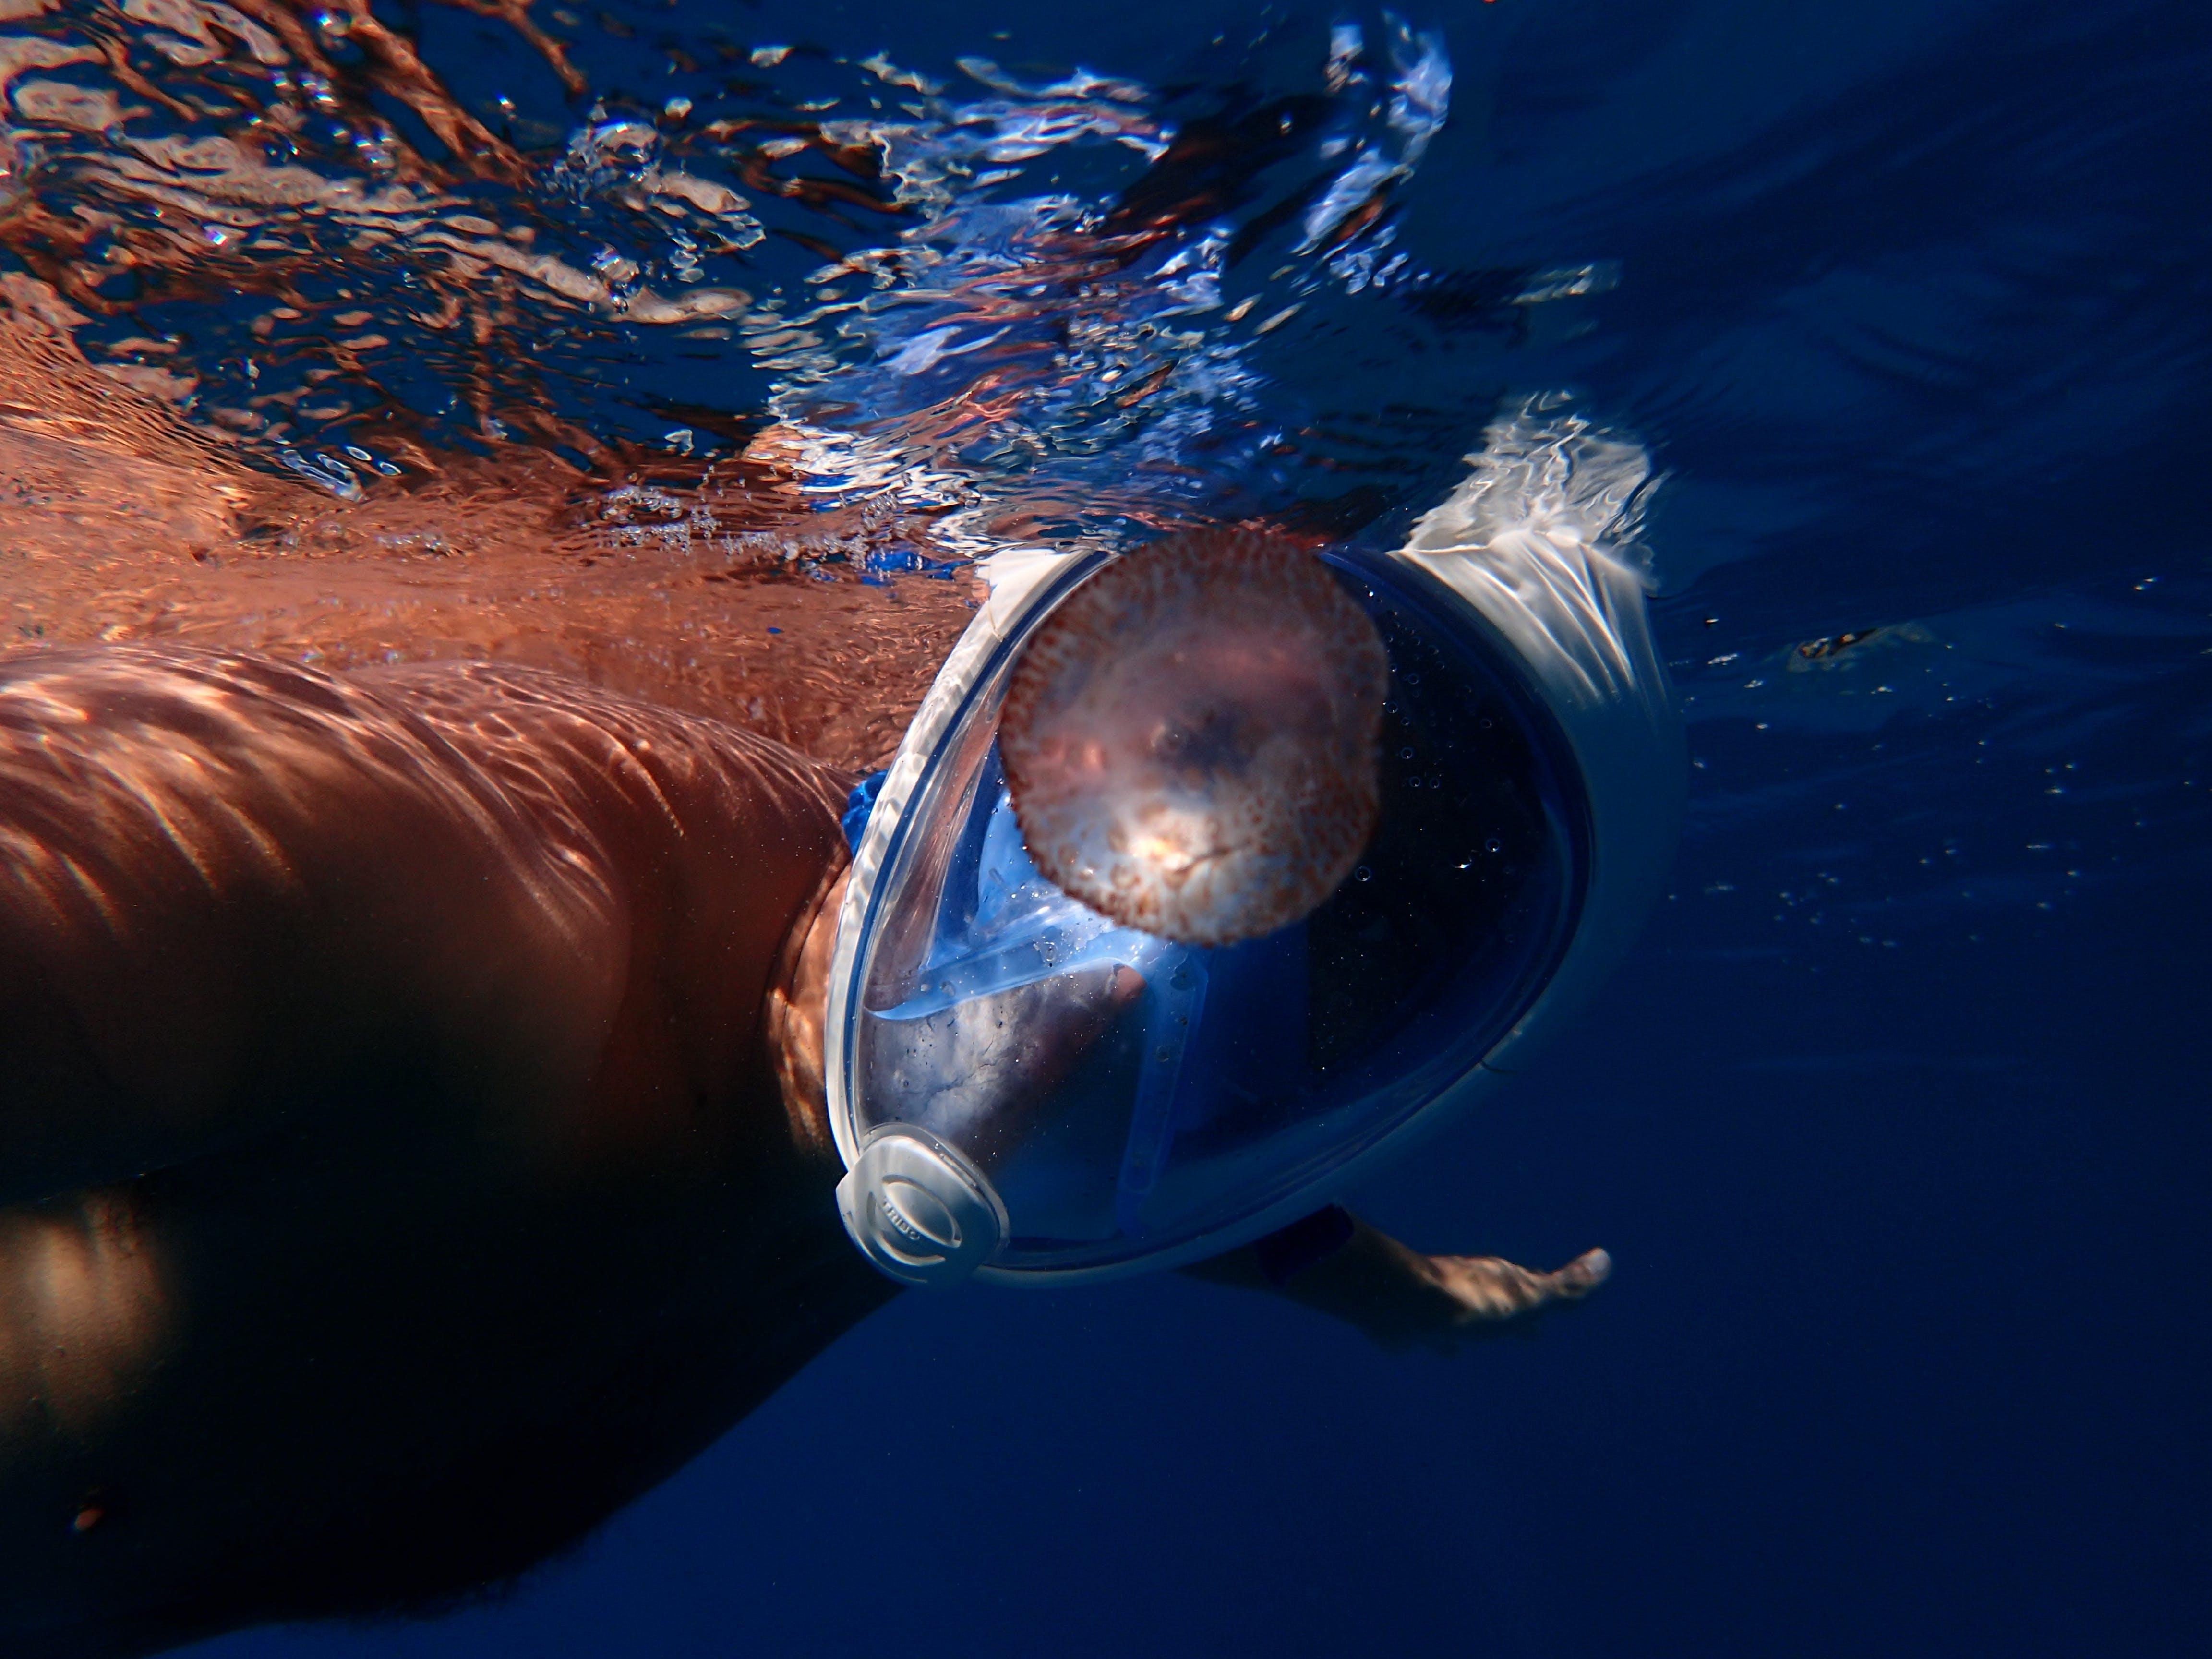 Man Swimming Wearing Full-face Snorkelling Mask